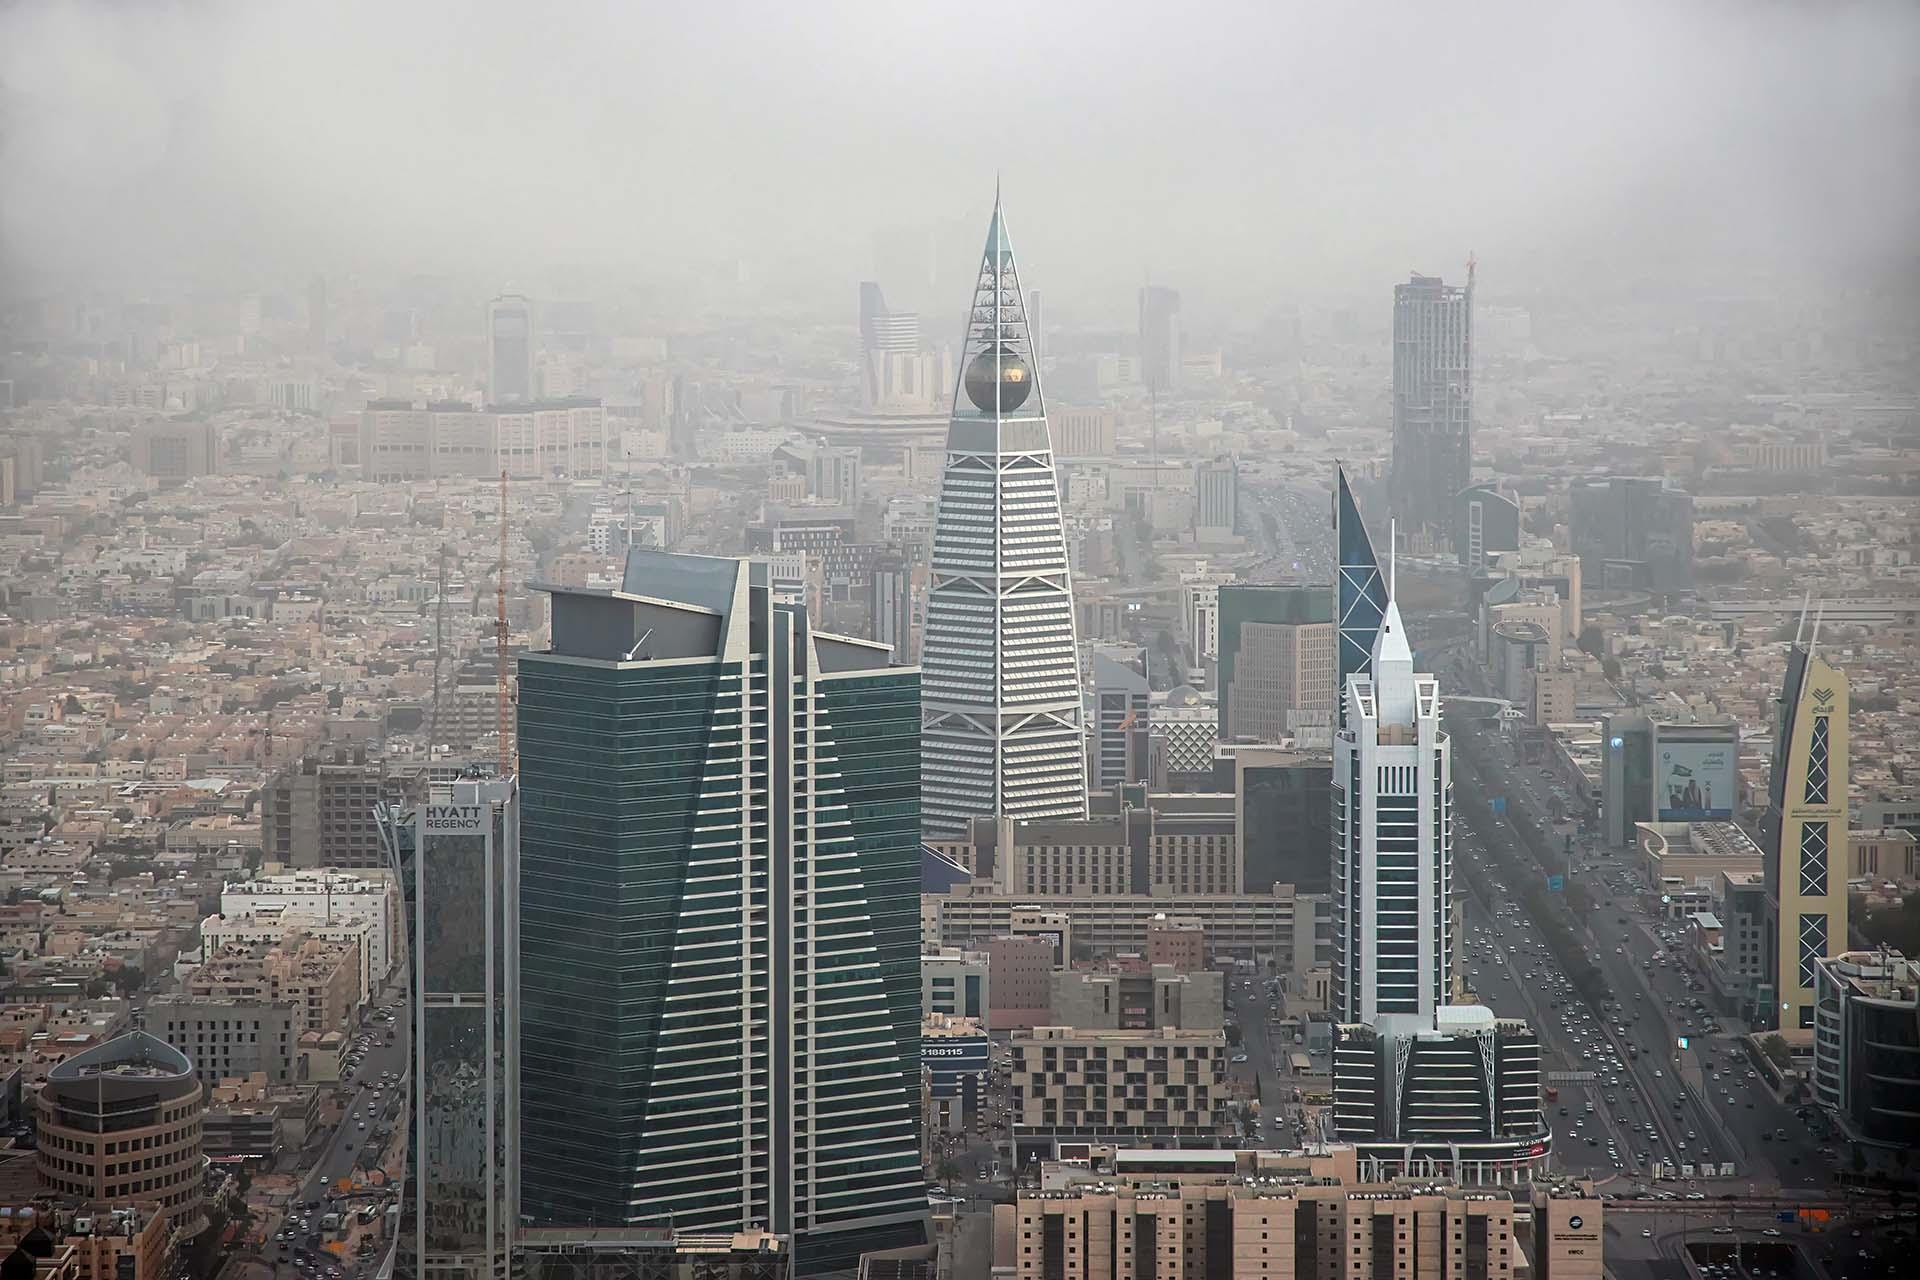 Ghostwriting Services in Saudi Arabia